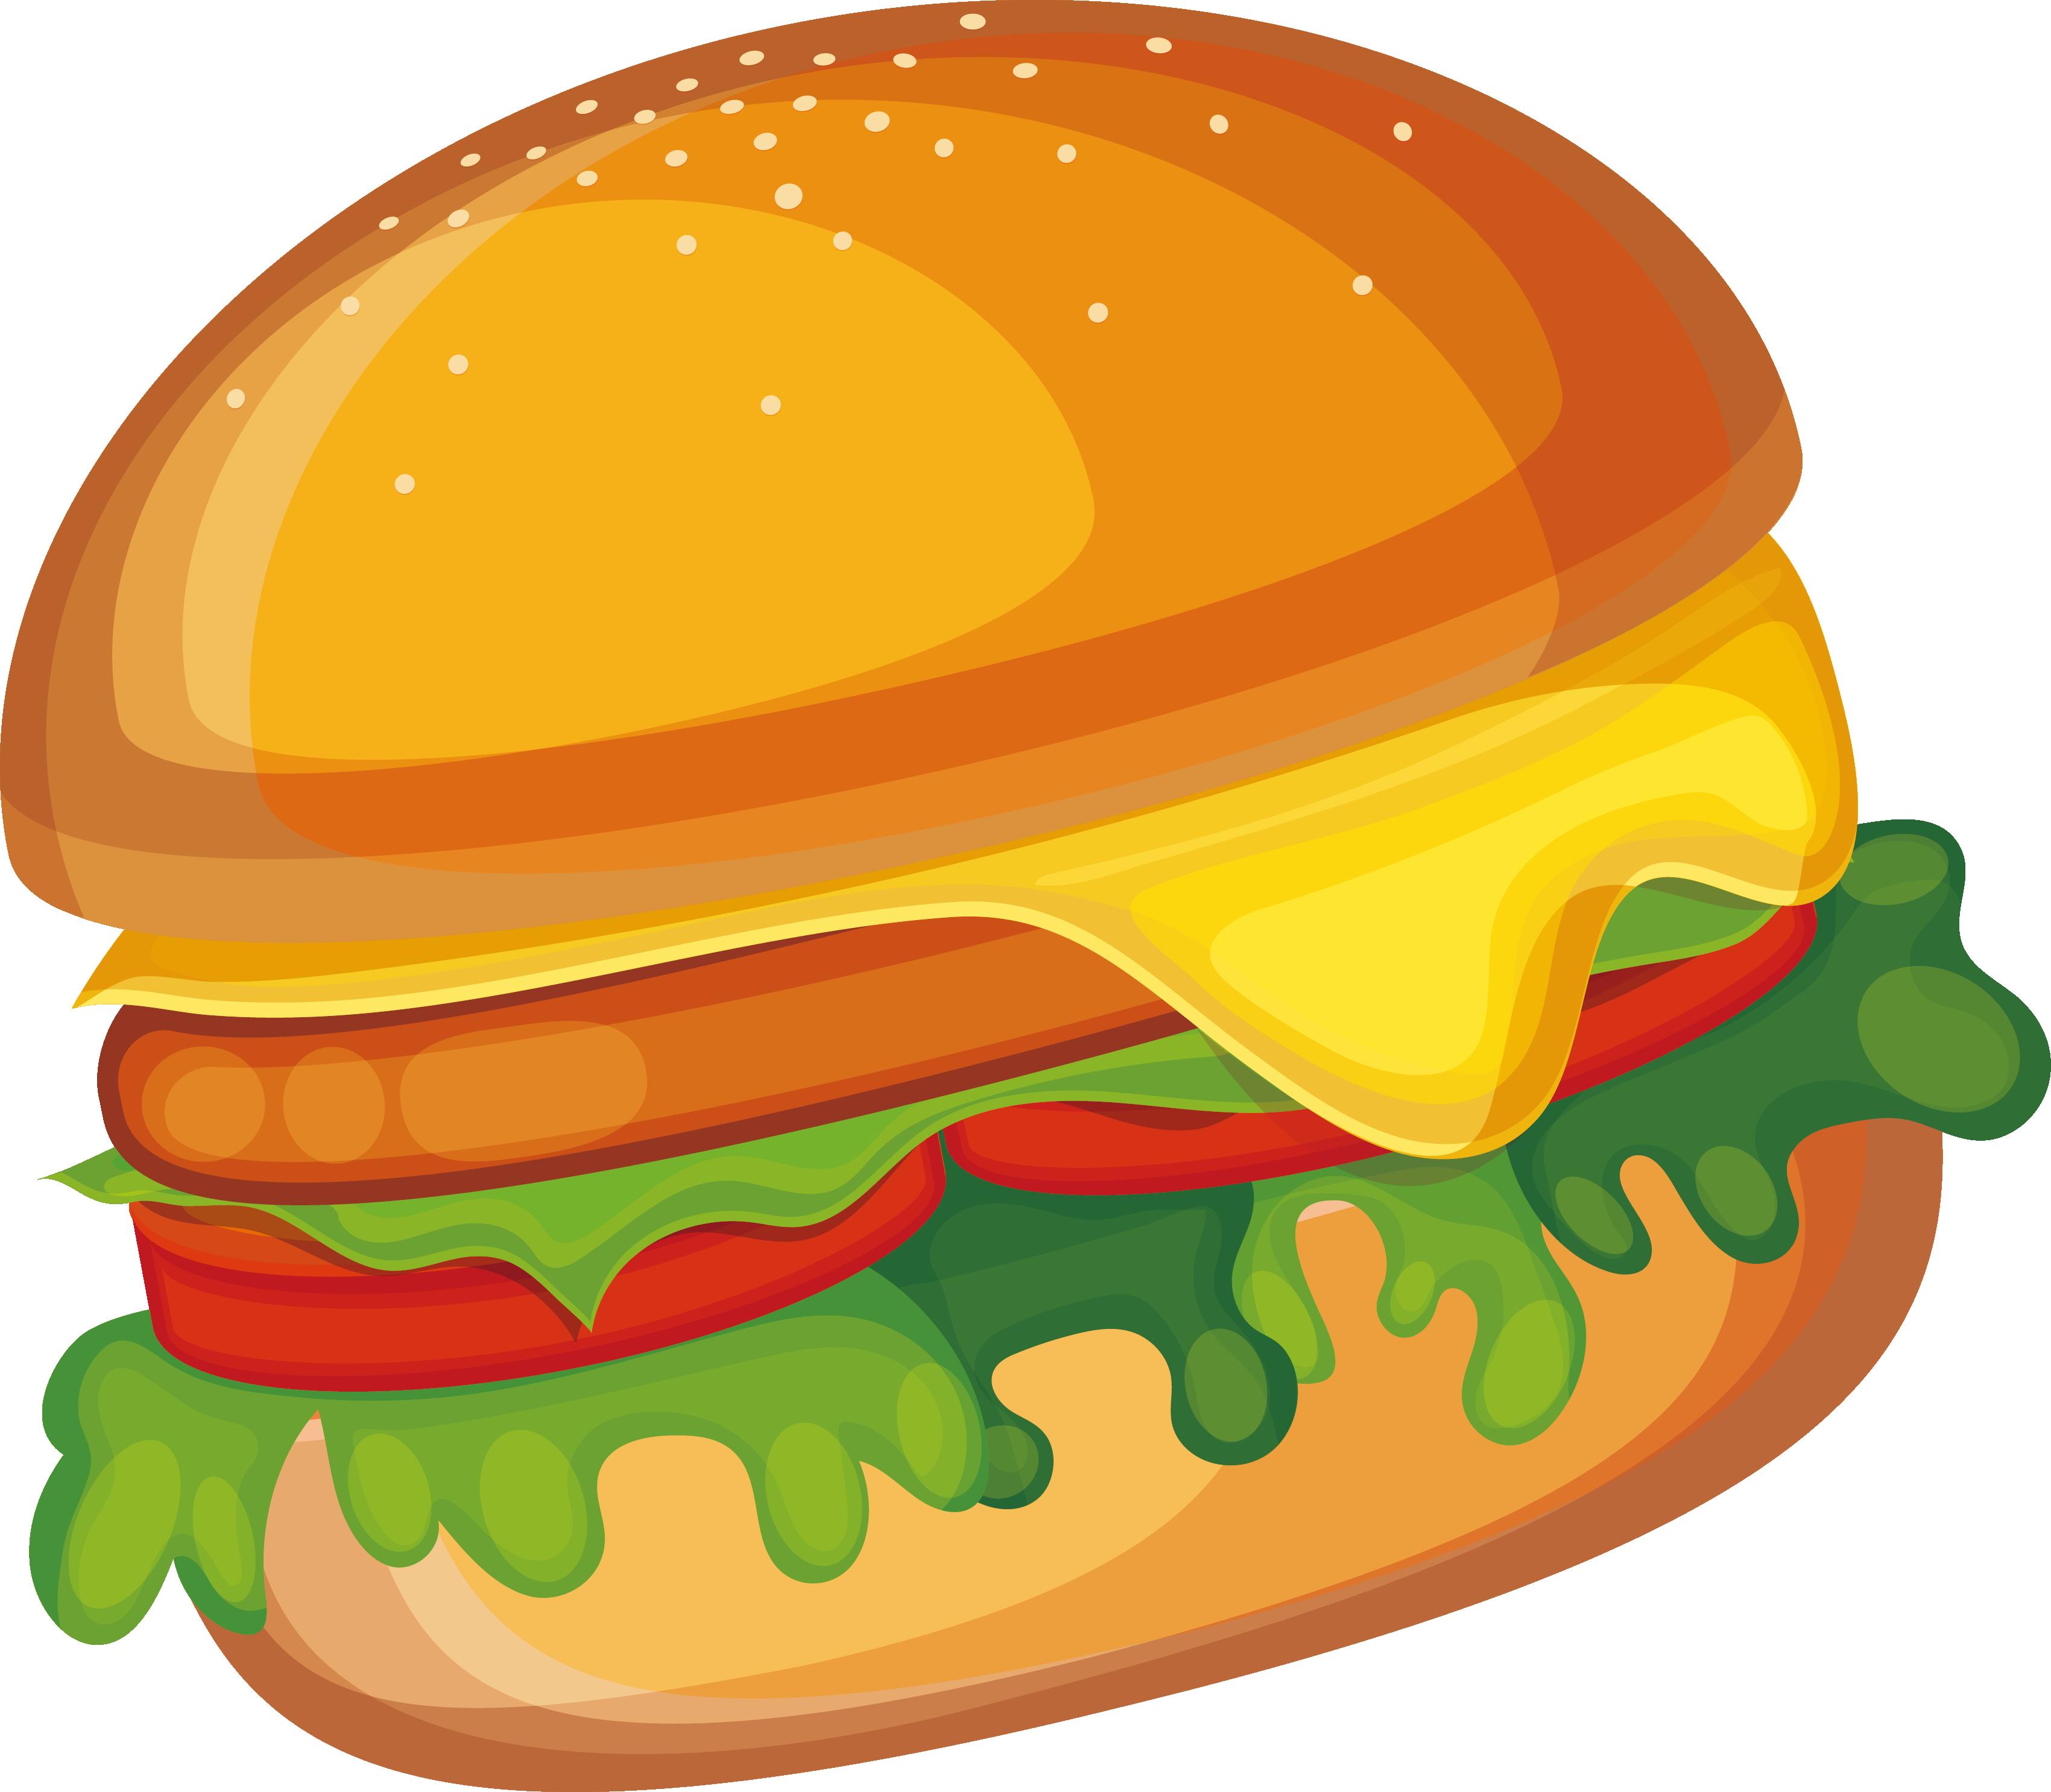 Burger veggie free for. Cheeseburger clipart double cheeseburger